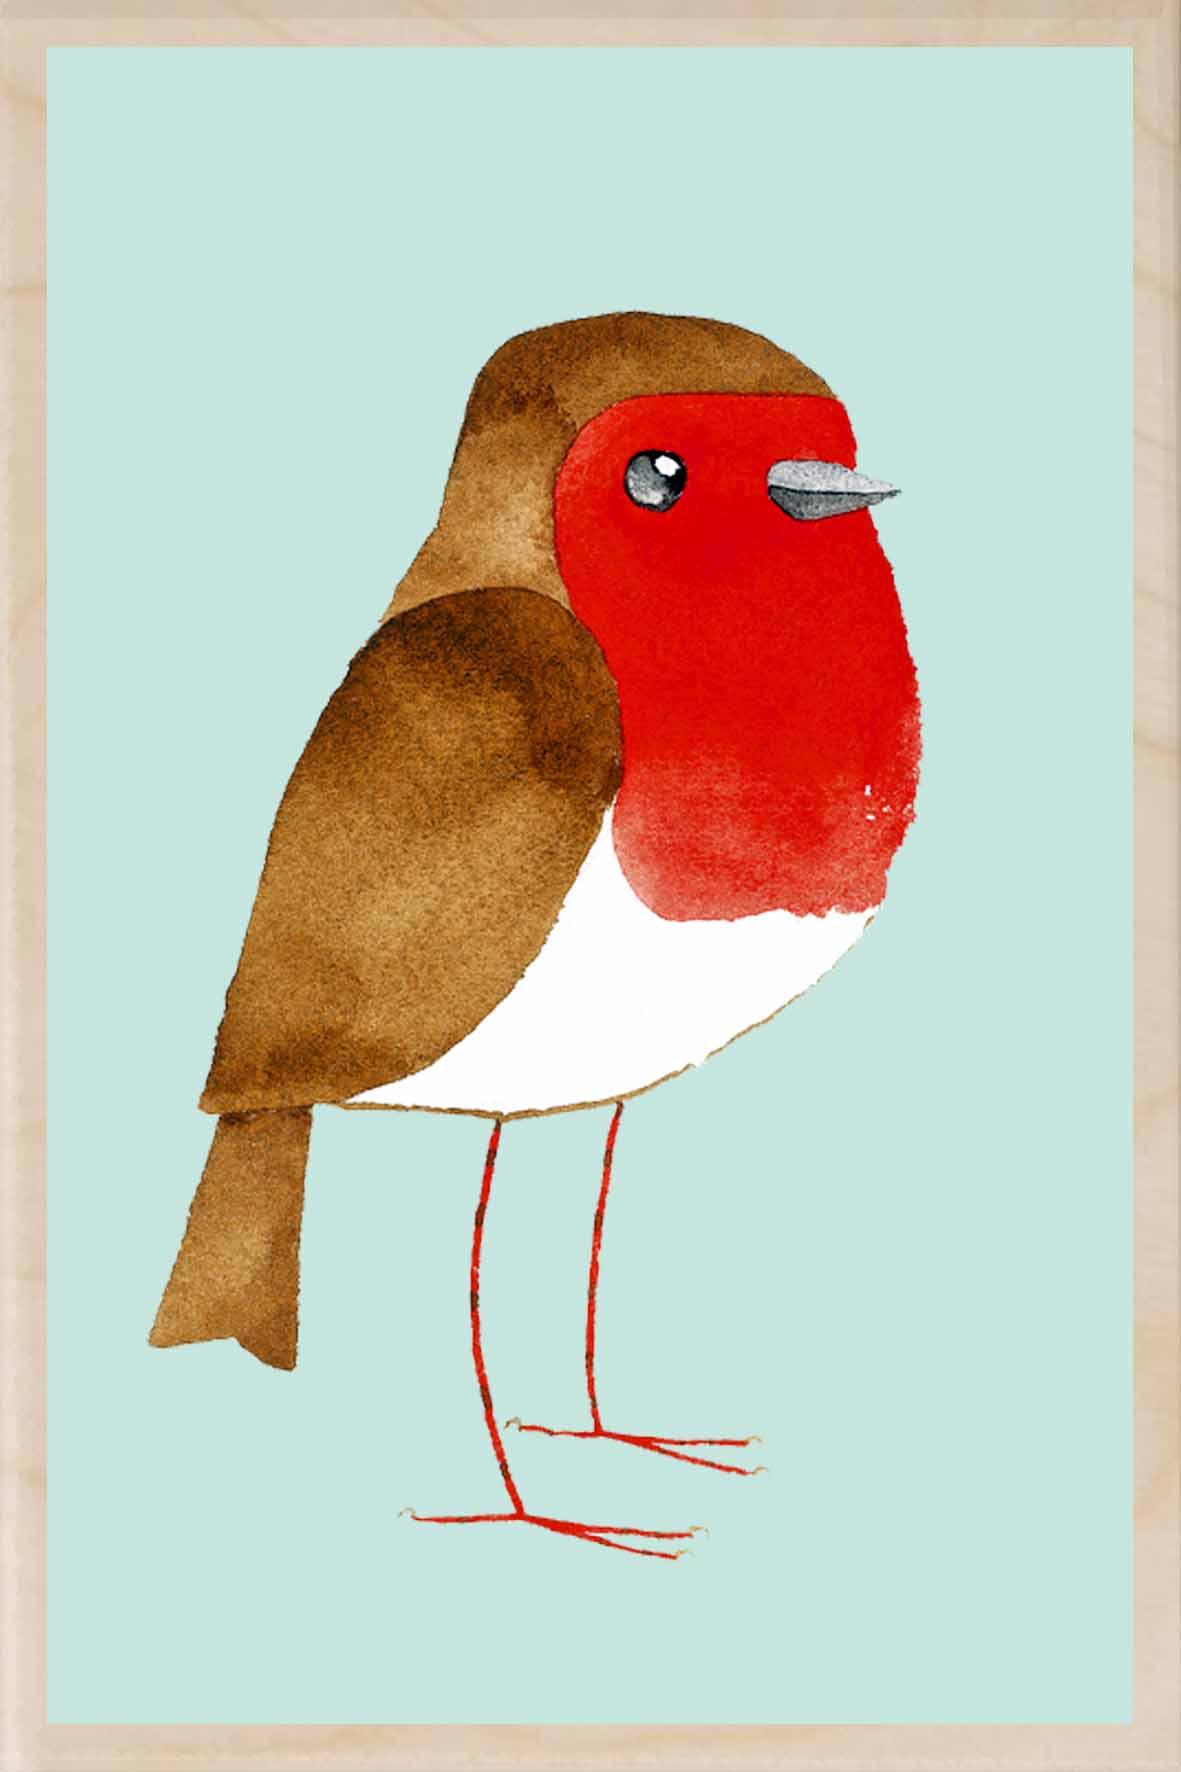 matt sewell robin the wooden postcard company houten postcard MS 14.jpg